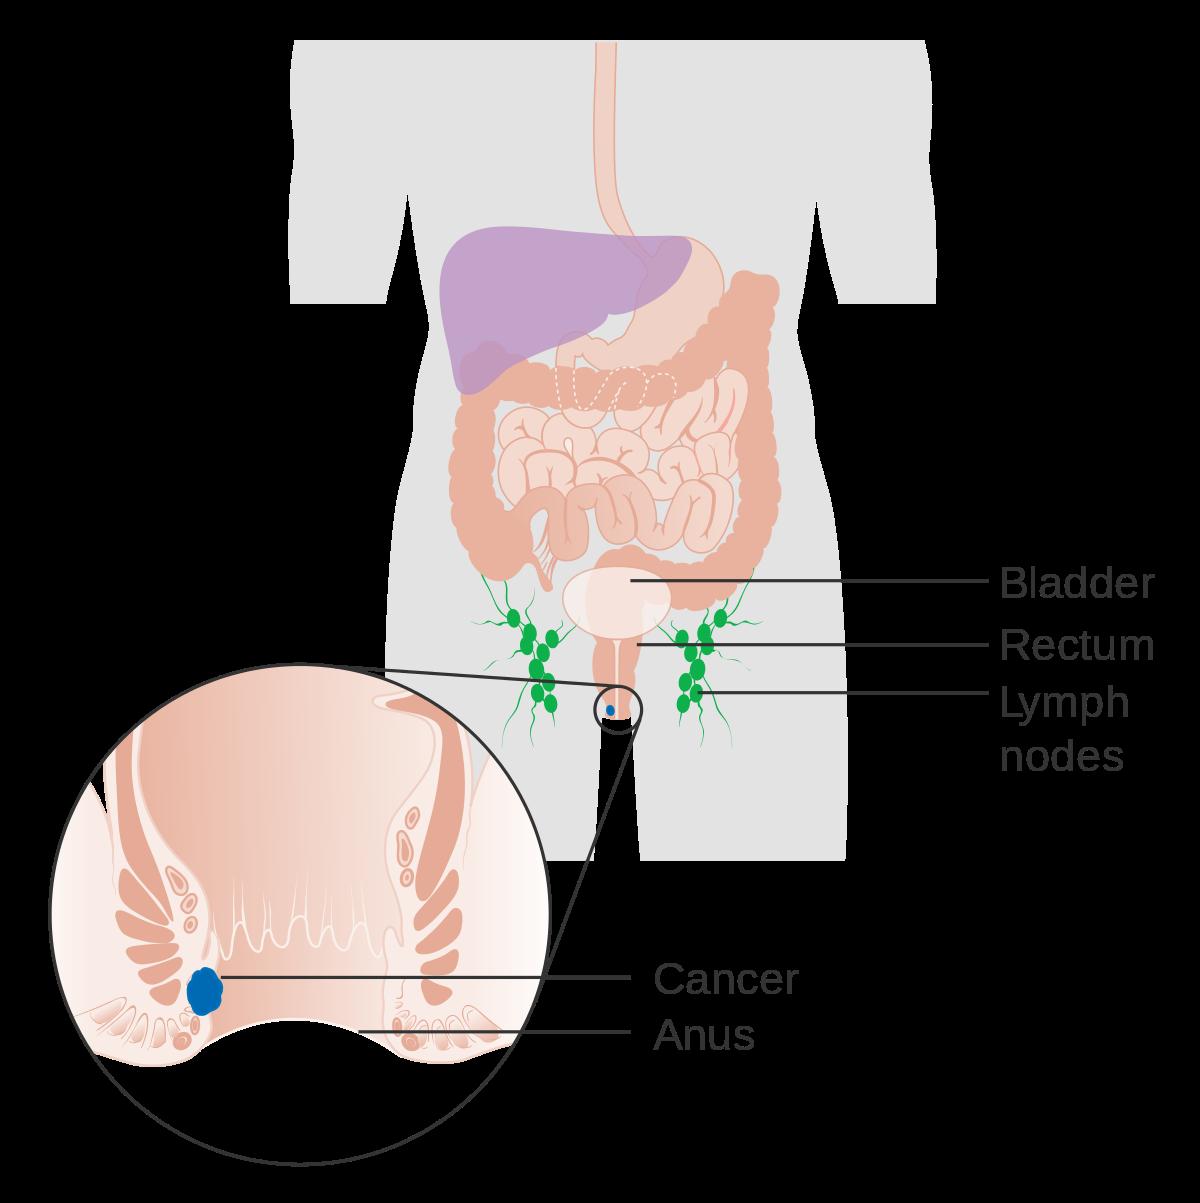 wart on foot medicine cancer pancreas quanto tempo de vida